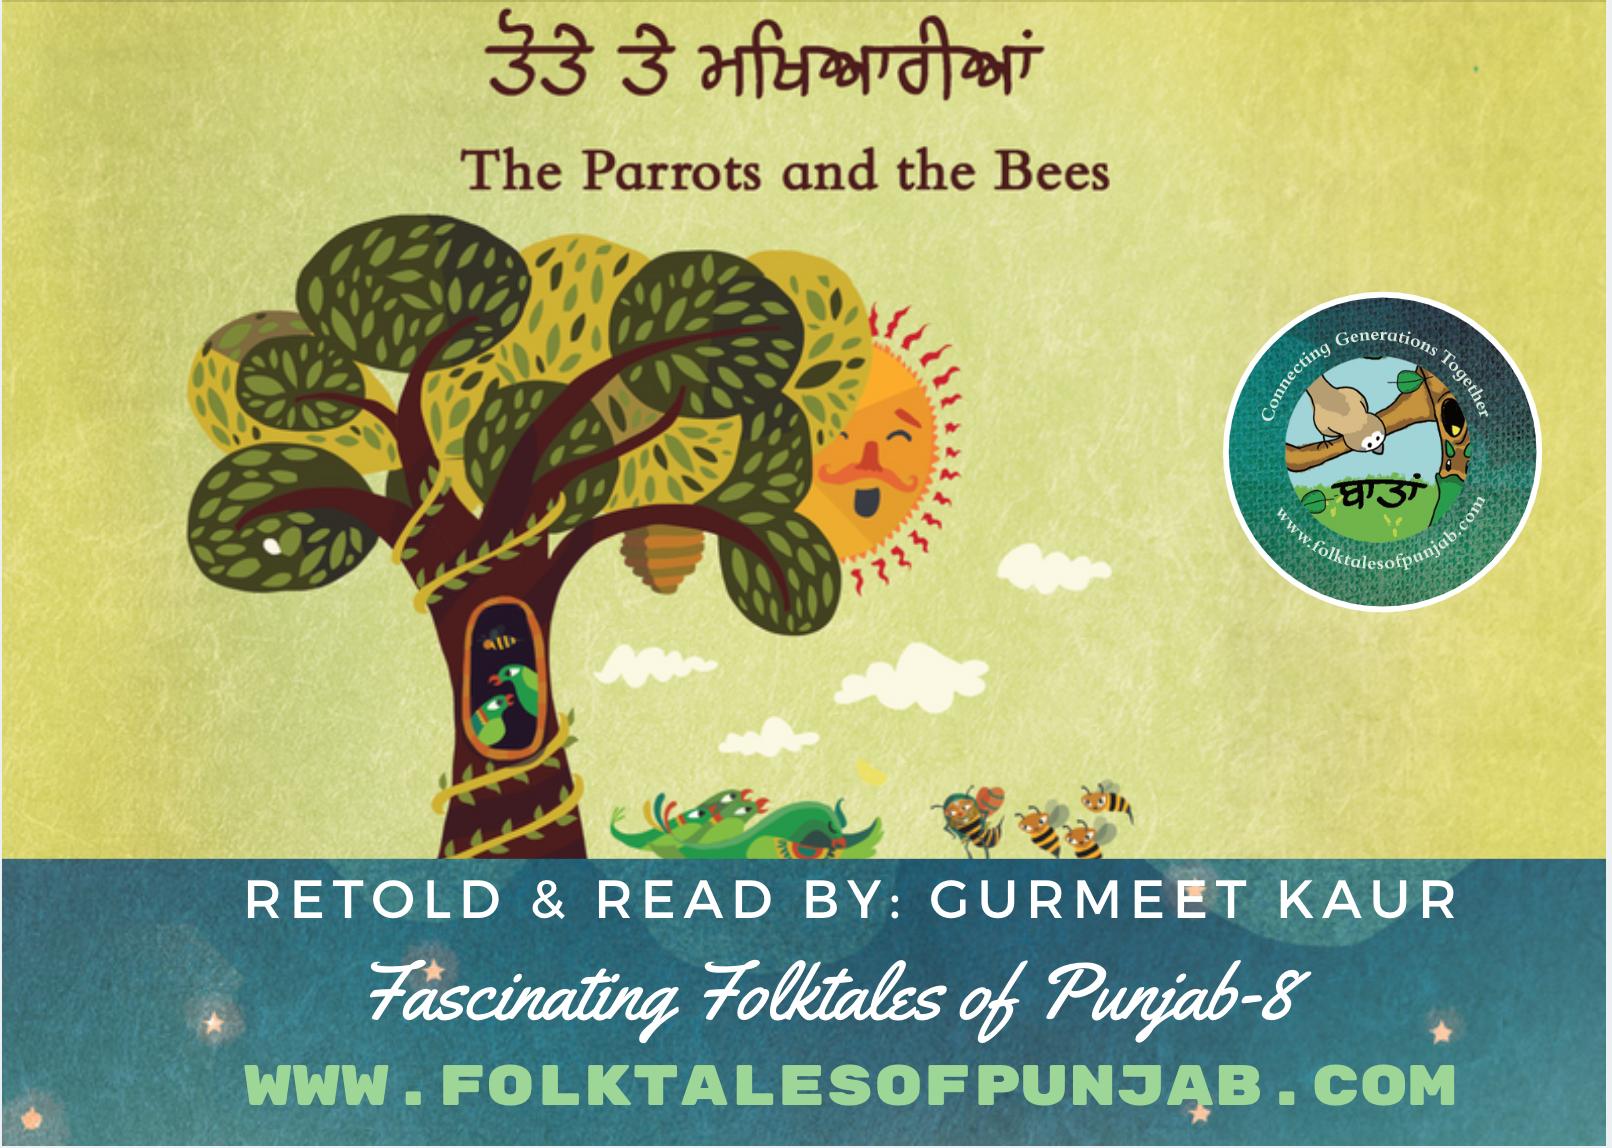 Fascinating Folktales - Engage Punjab 2019 - Project Details